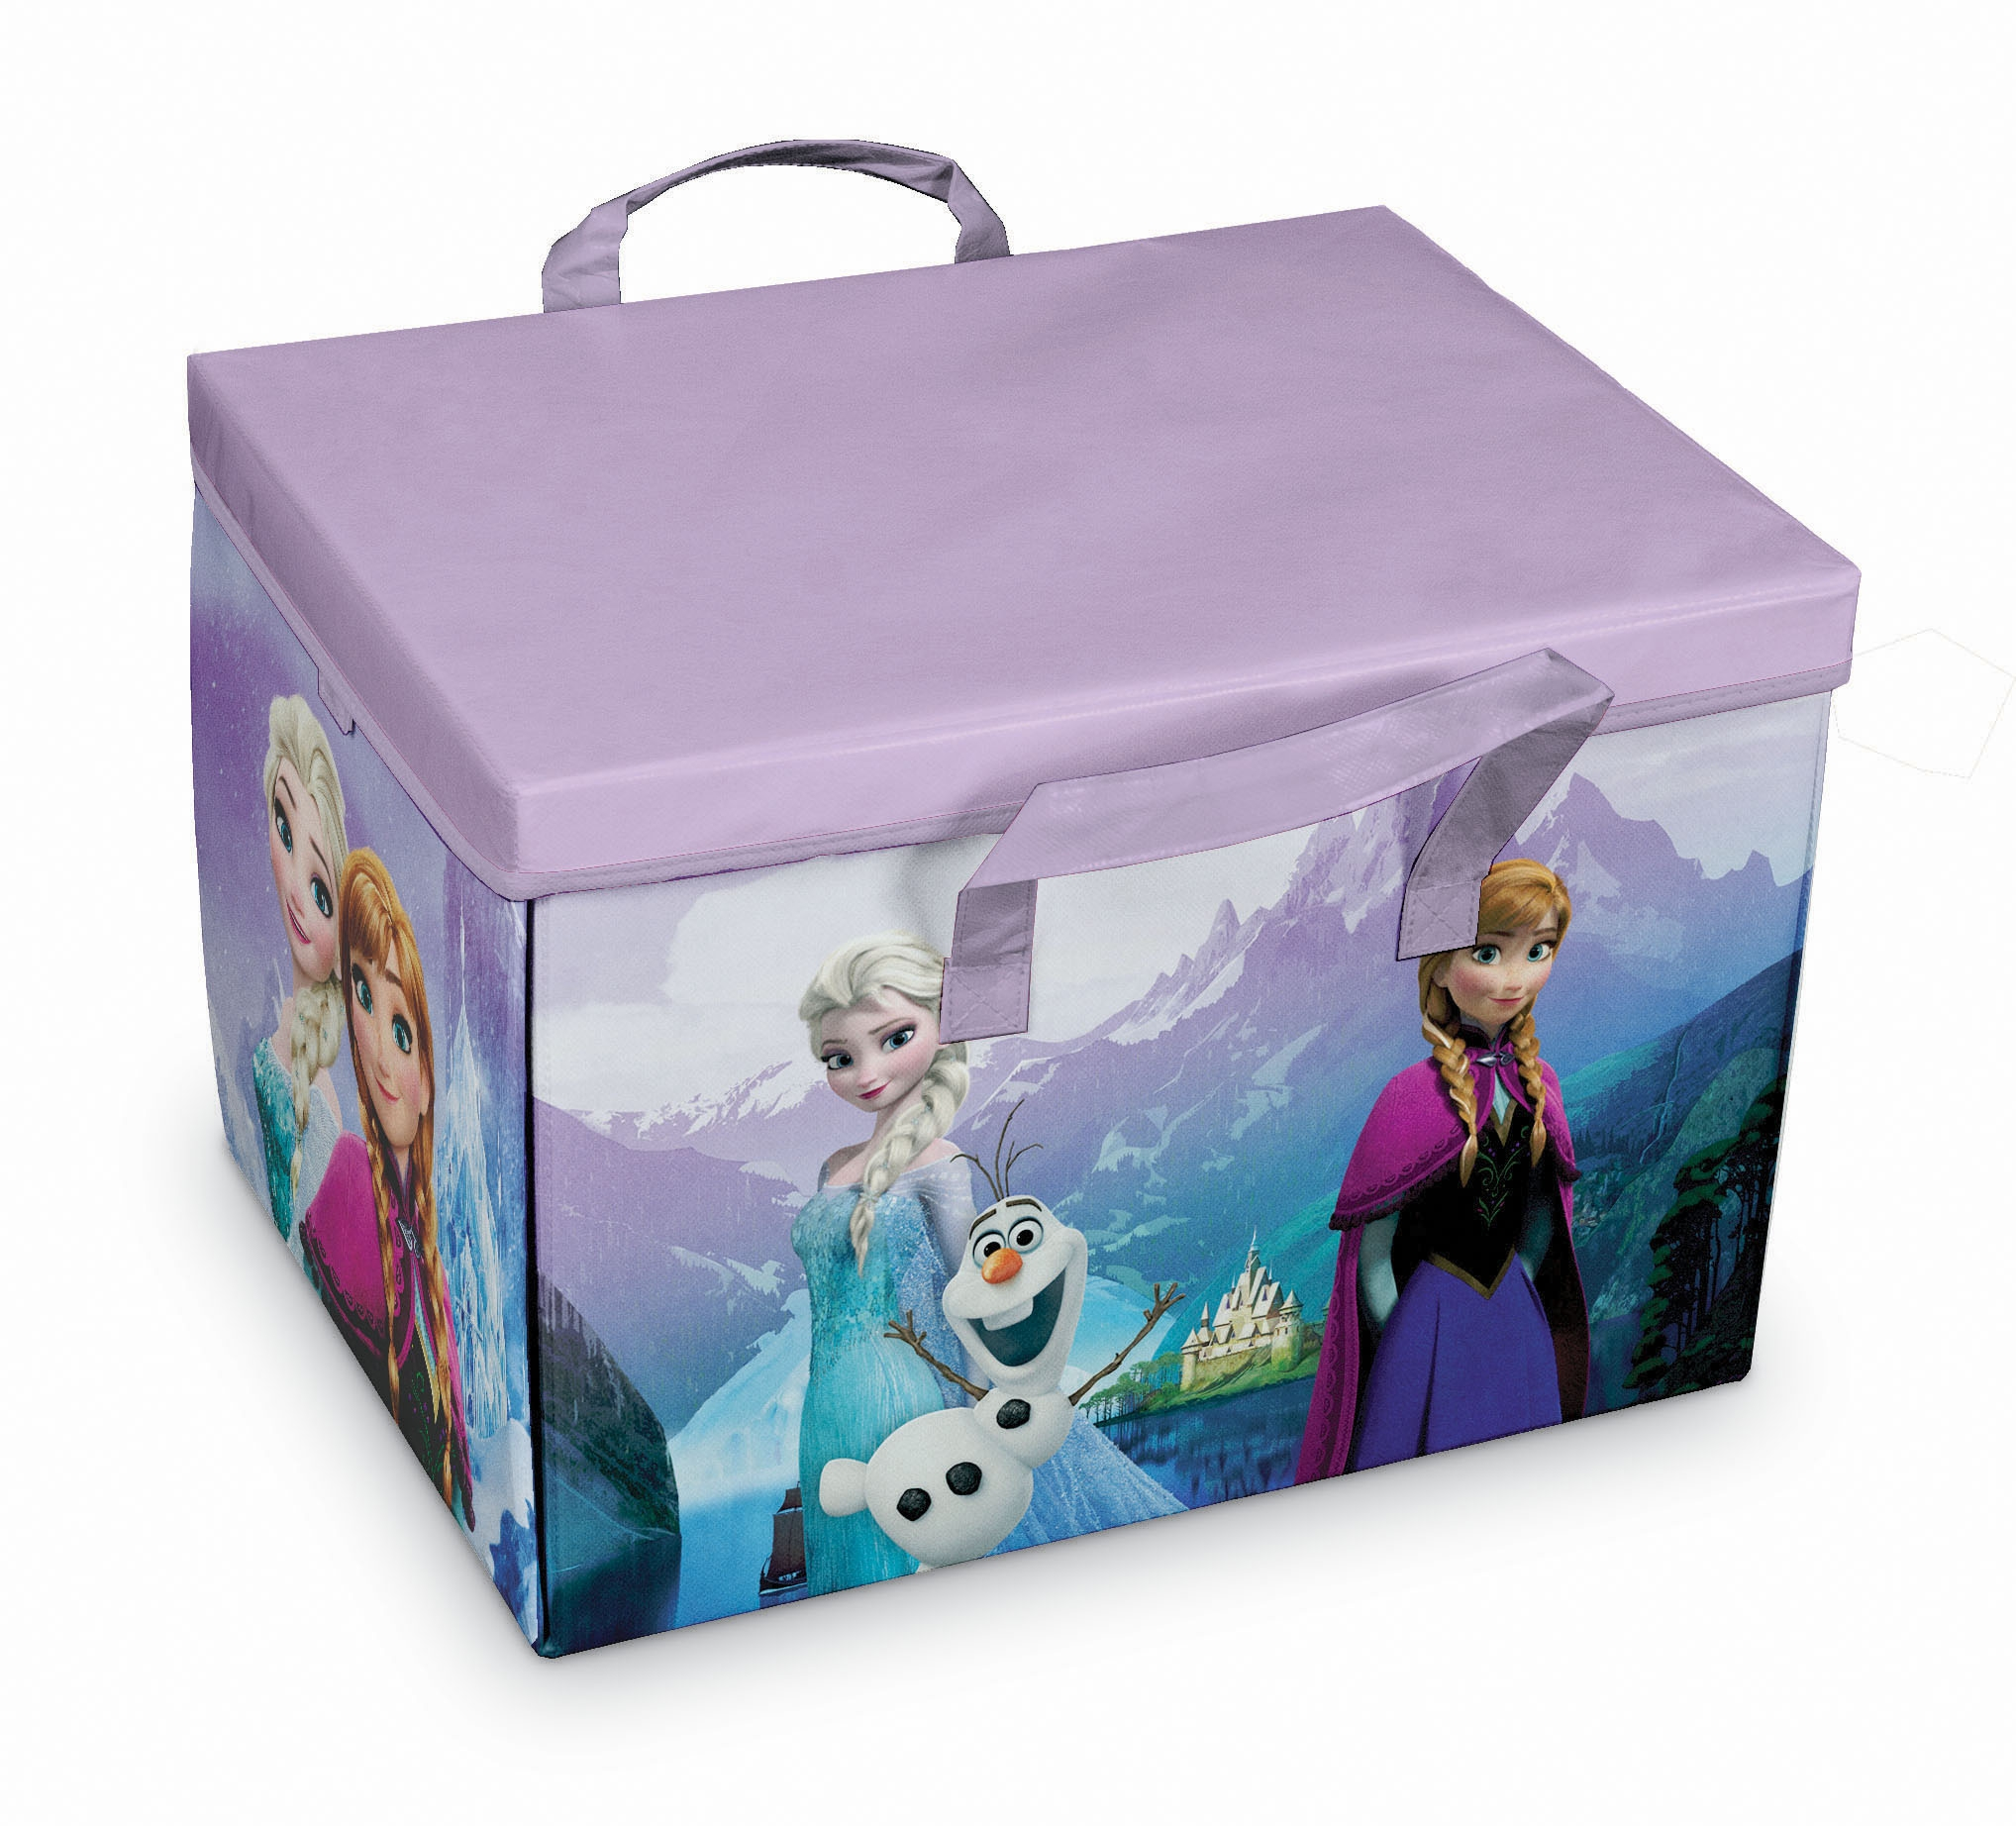 Cutie pentru depozitare jucarii 2 in 1, Frozen Play Violet, L41xl31xH28 cm imagine